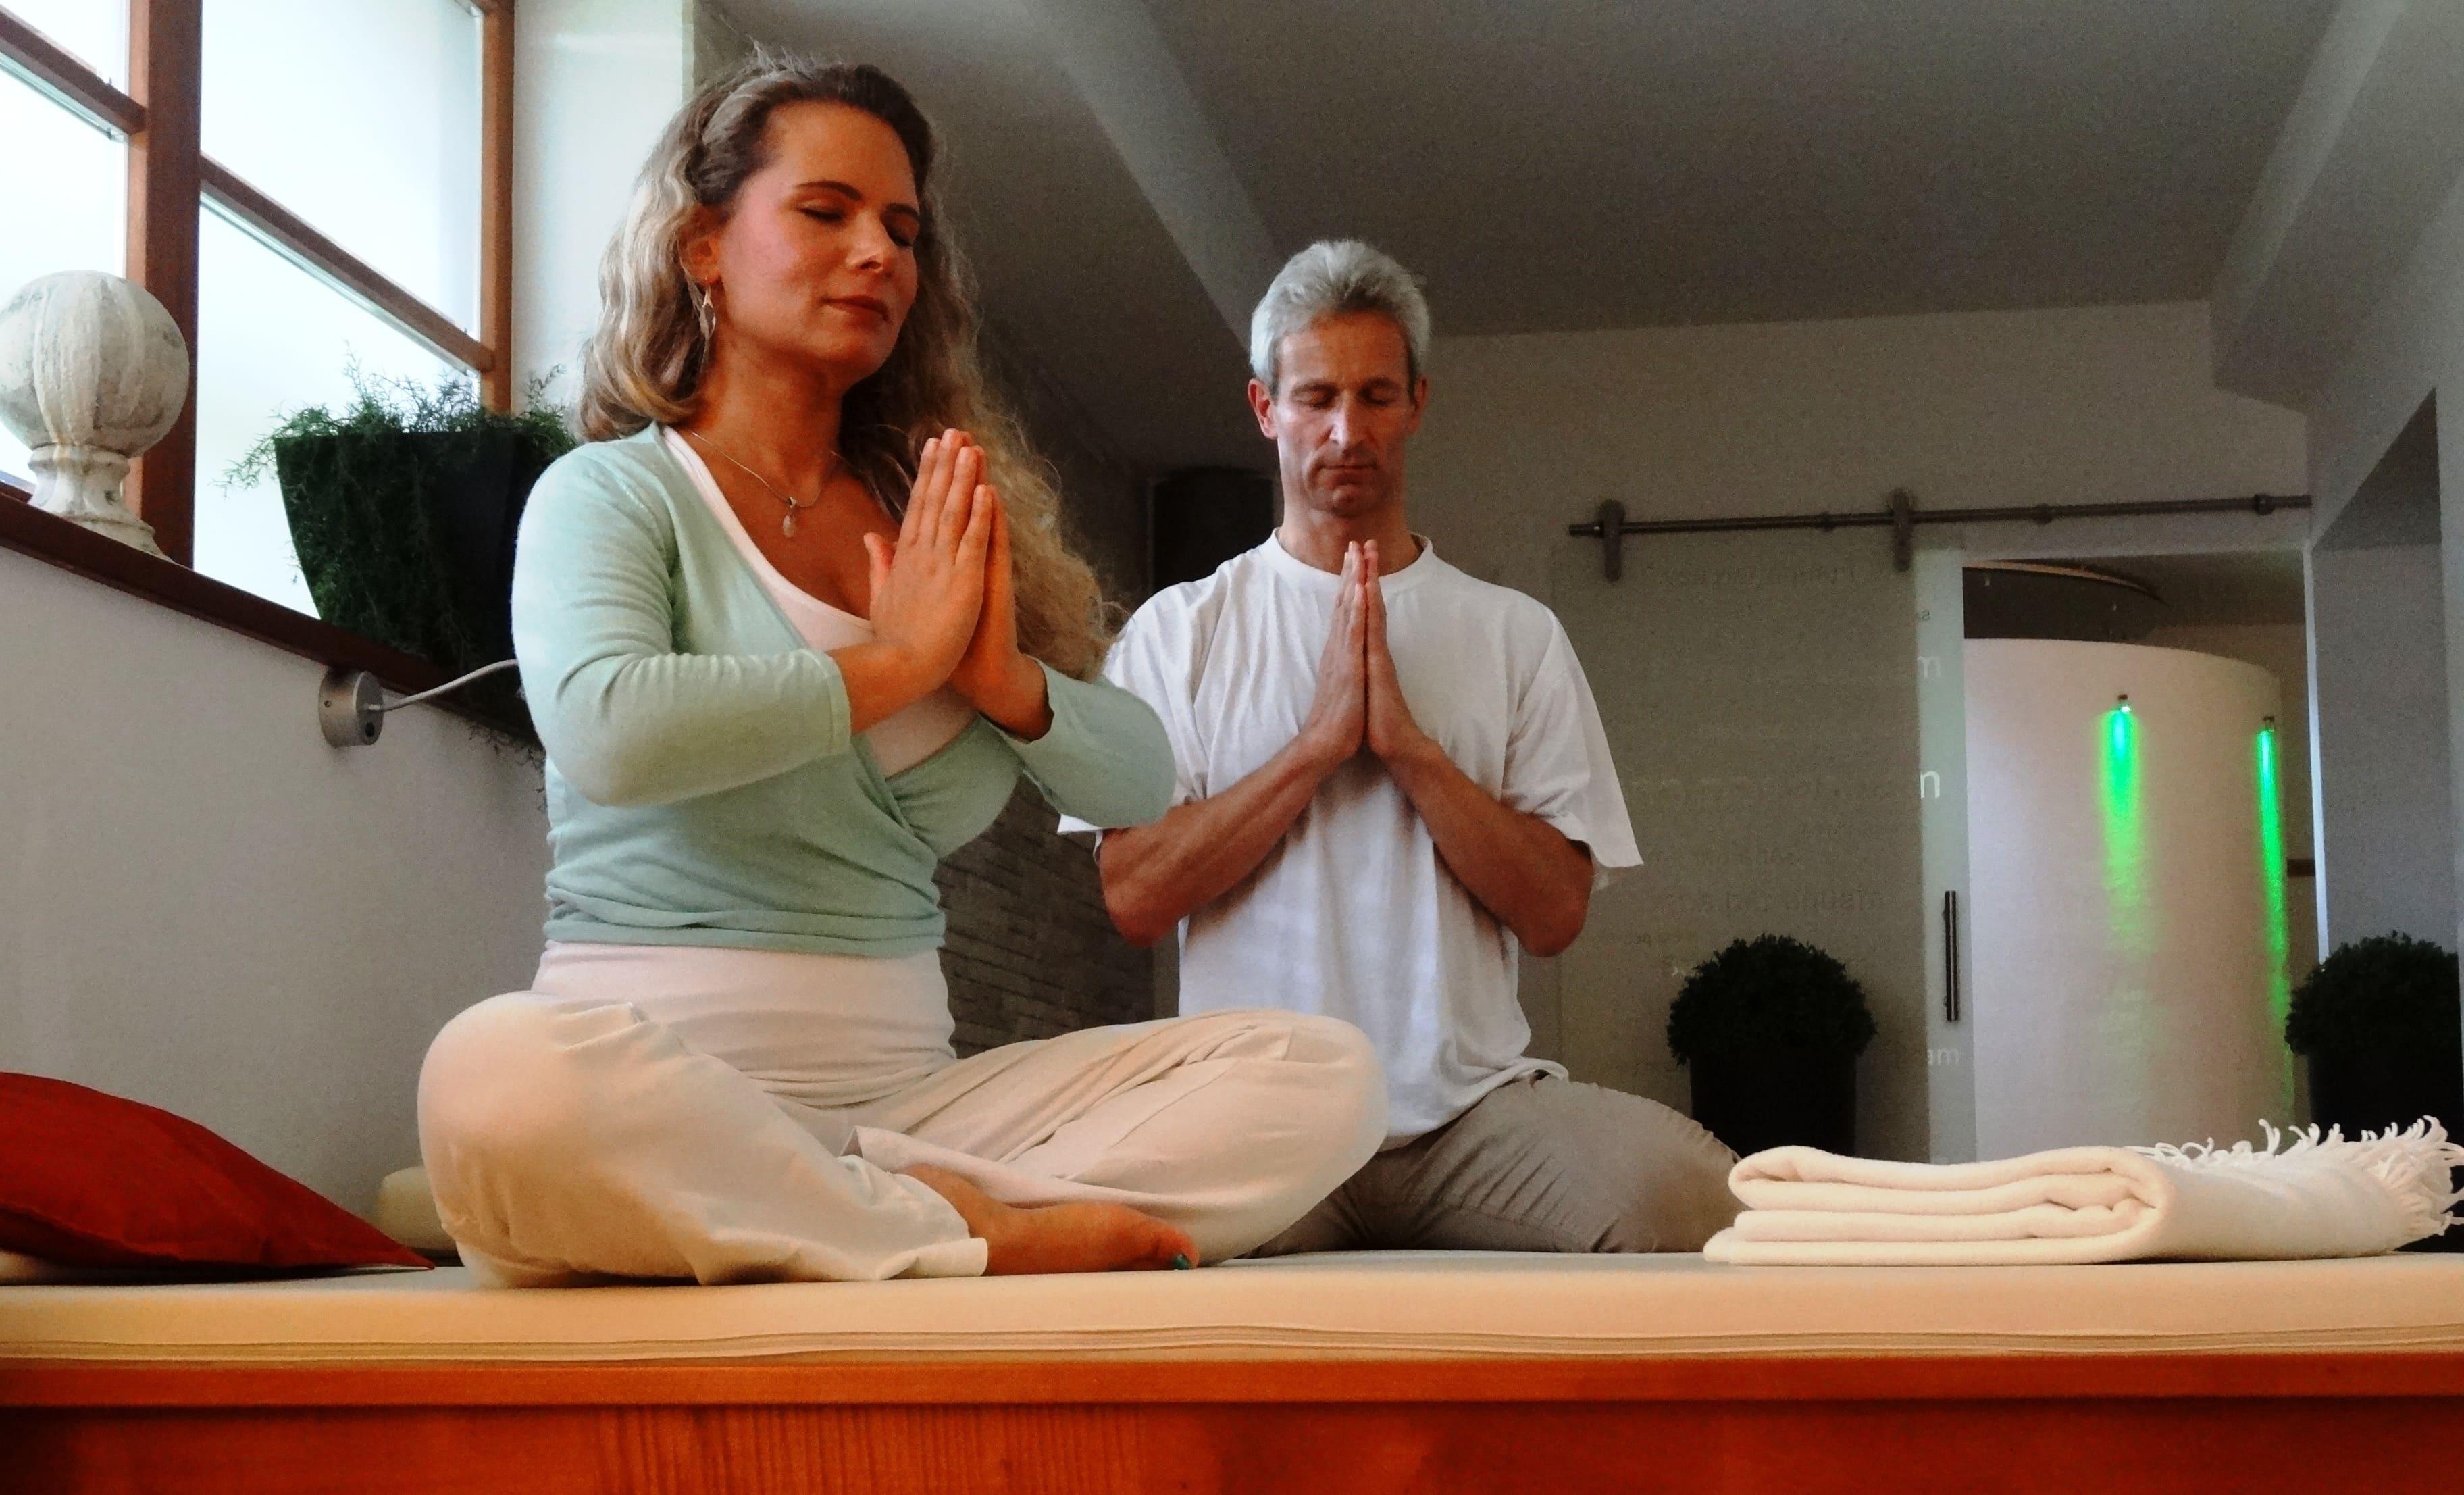 Meditations-Intensiv-Kurs für Anfänger @ Praxis-Seminar-Zentrum BEDADEVA